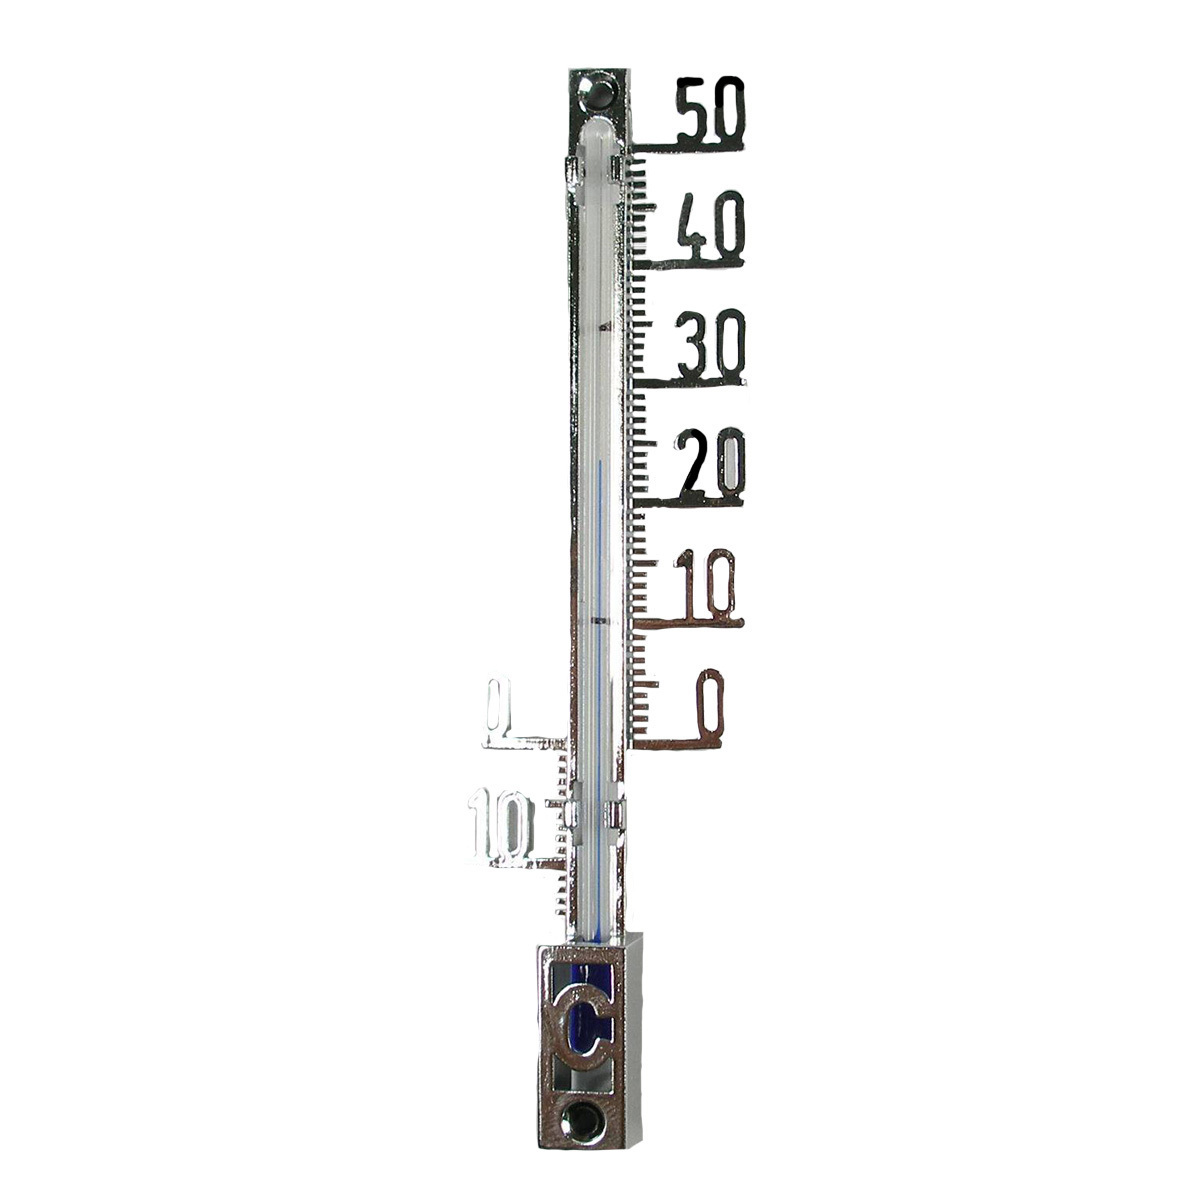 12-6000-54-analoges-aussenthermometer-1200x1200px.jpg